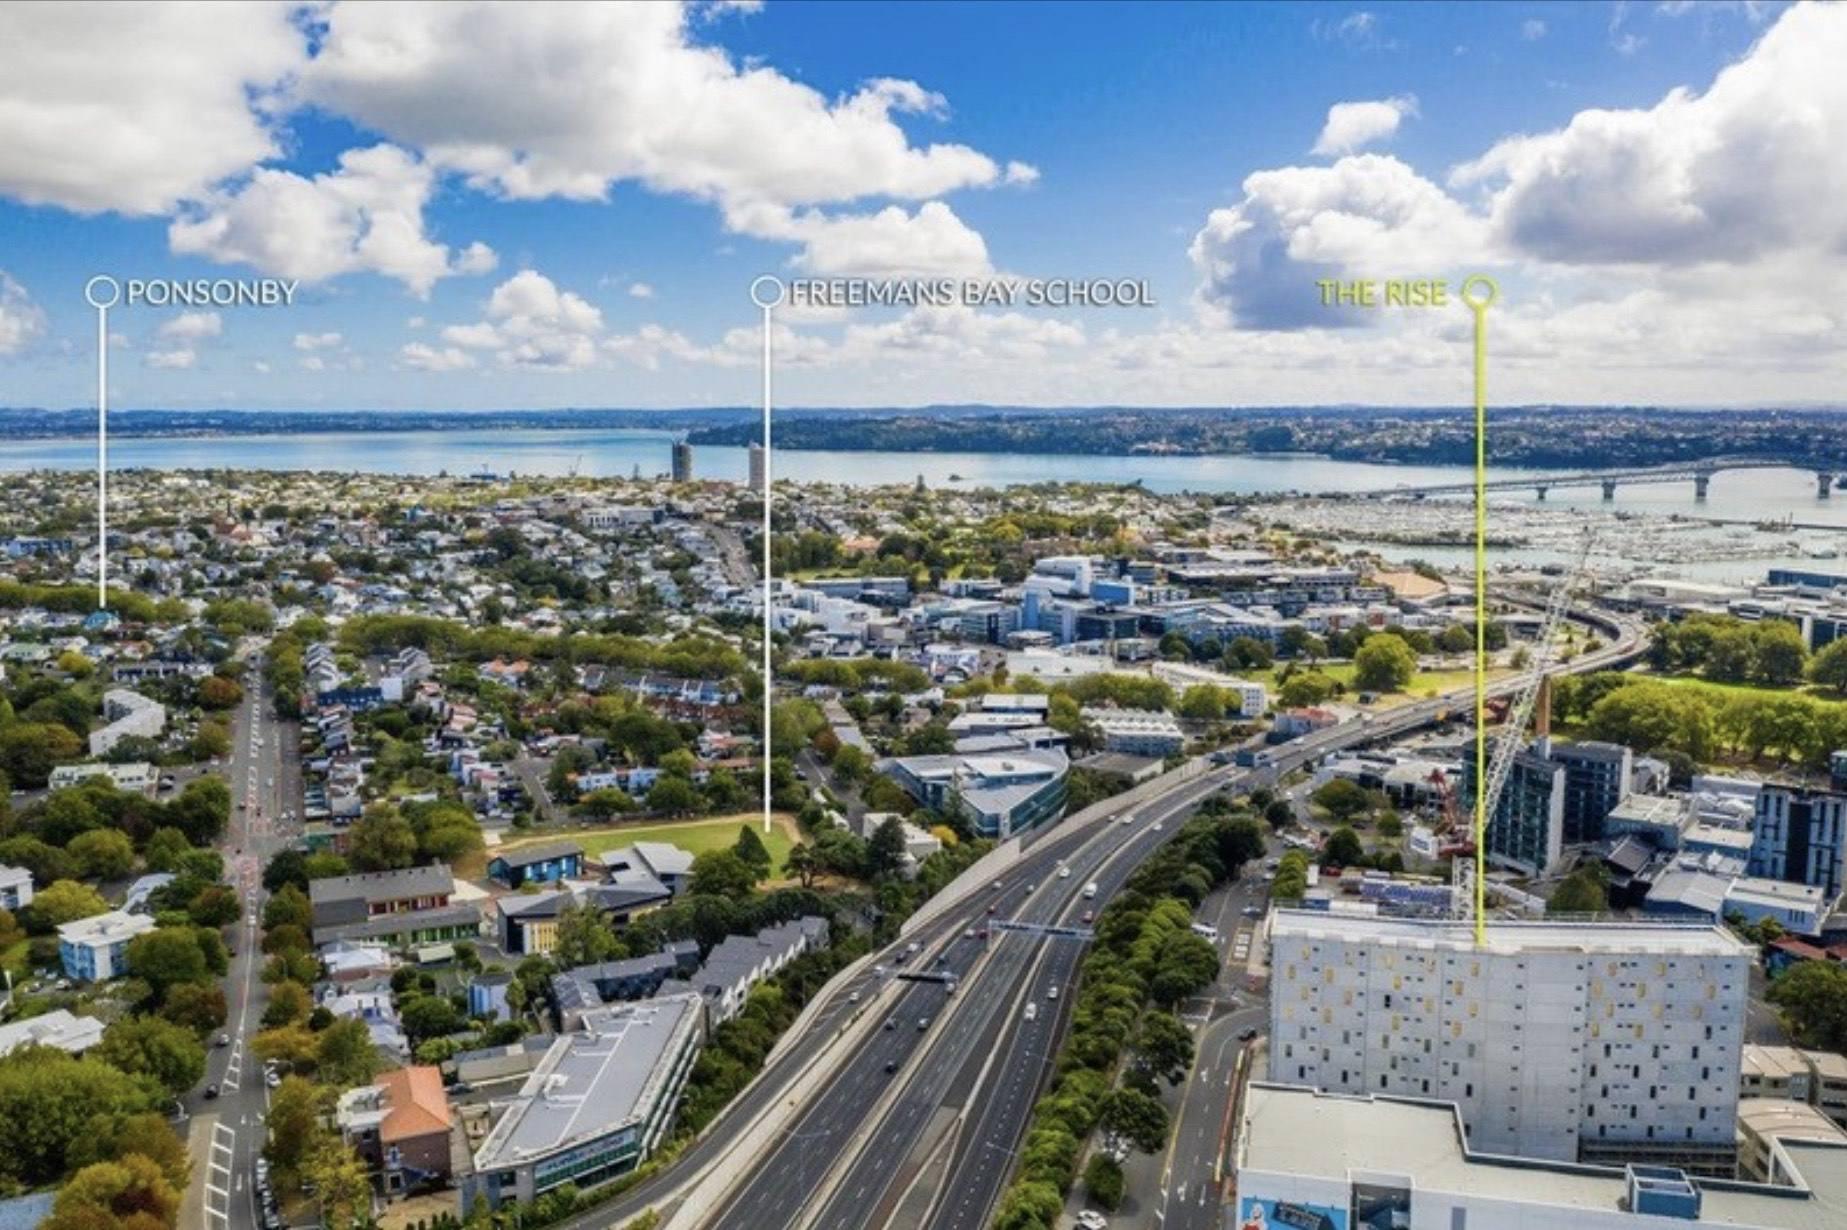 Auckland Central 2房 全新北向美宅 临海而居 饱览城市风光 步行至市中心 机会仅有一次! Quite the star on Union Green...